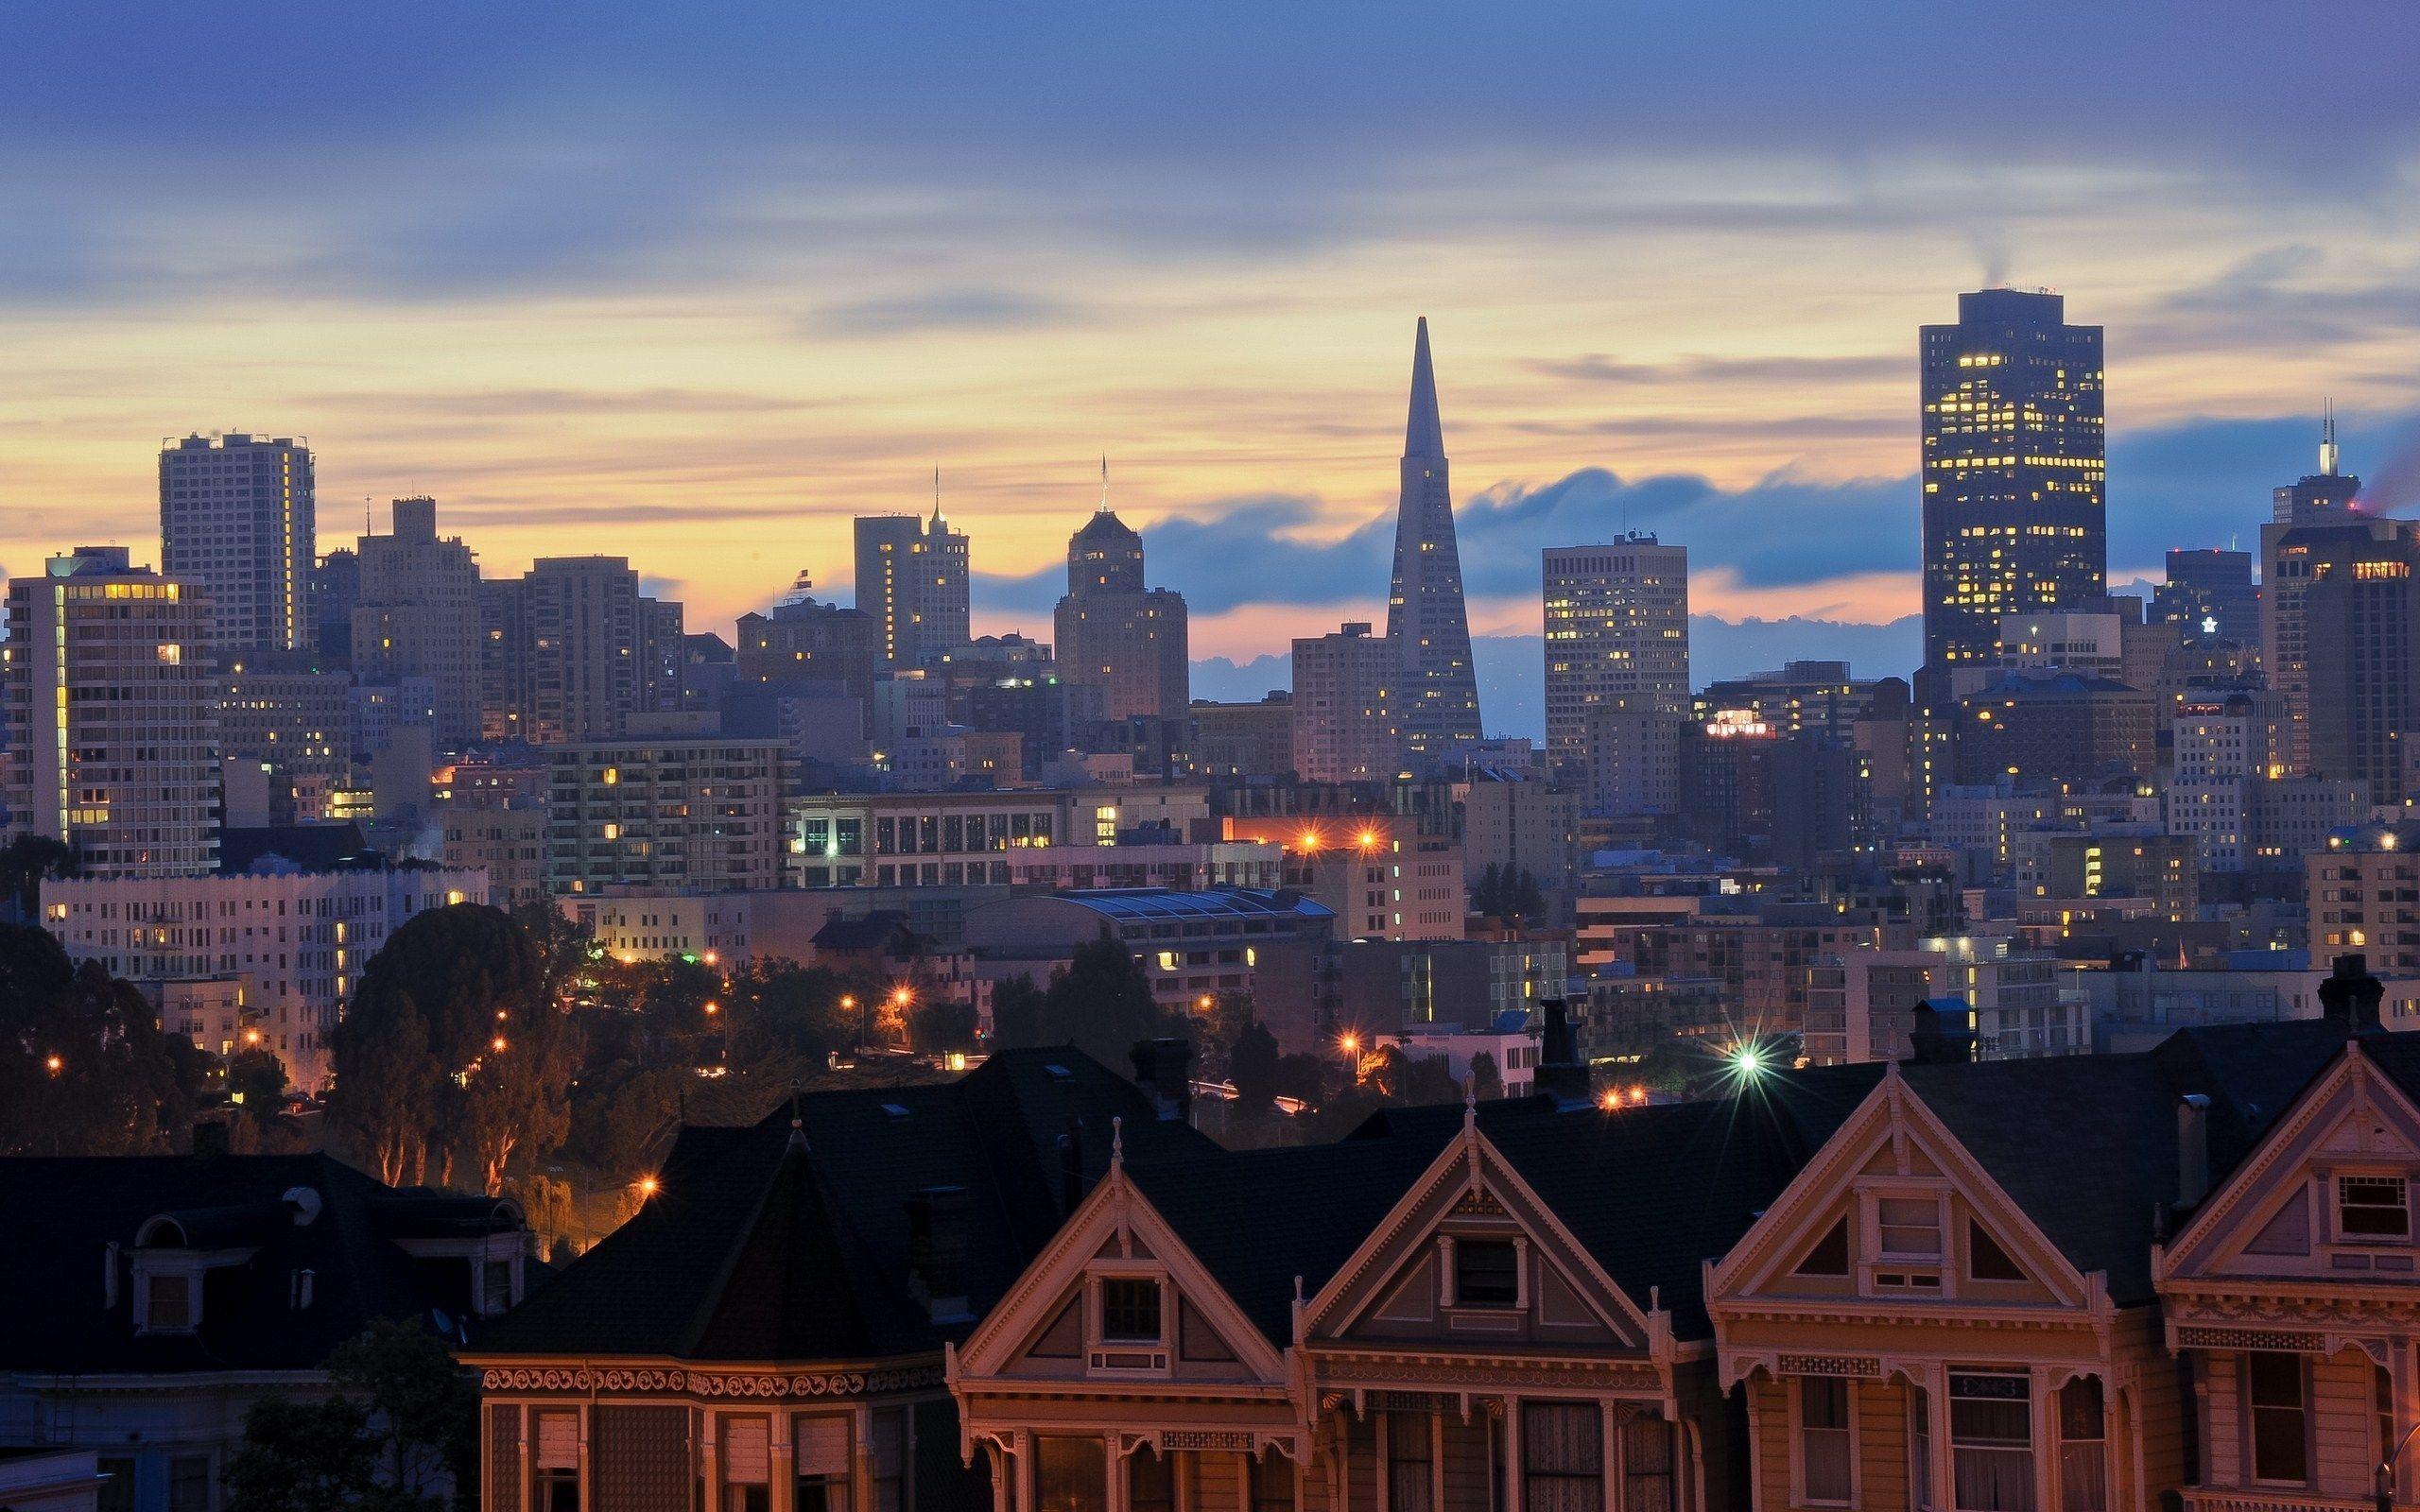 San Francisco Wallpapers HD 2560x1600